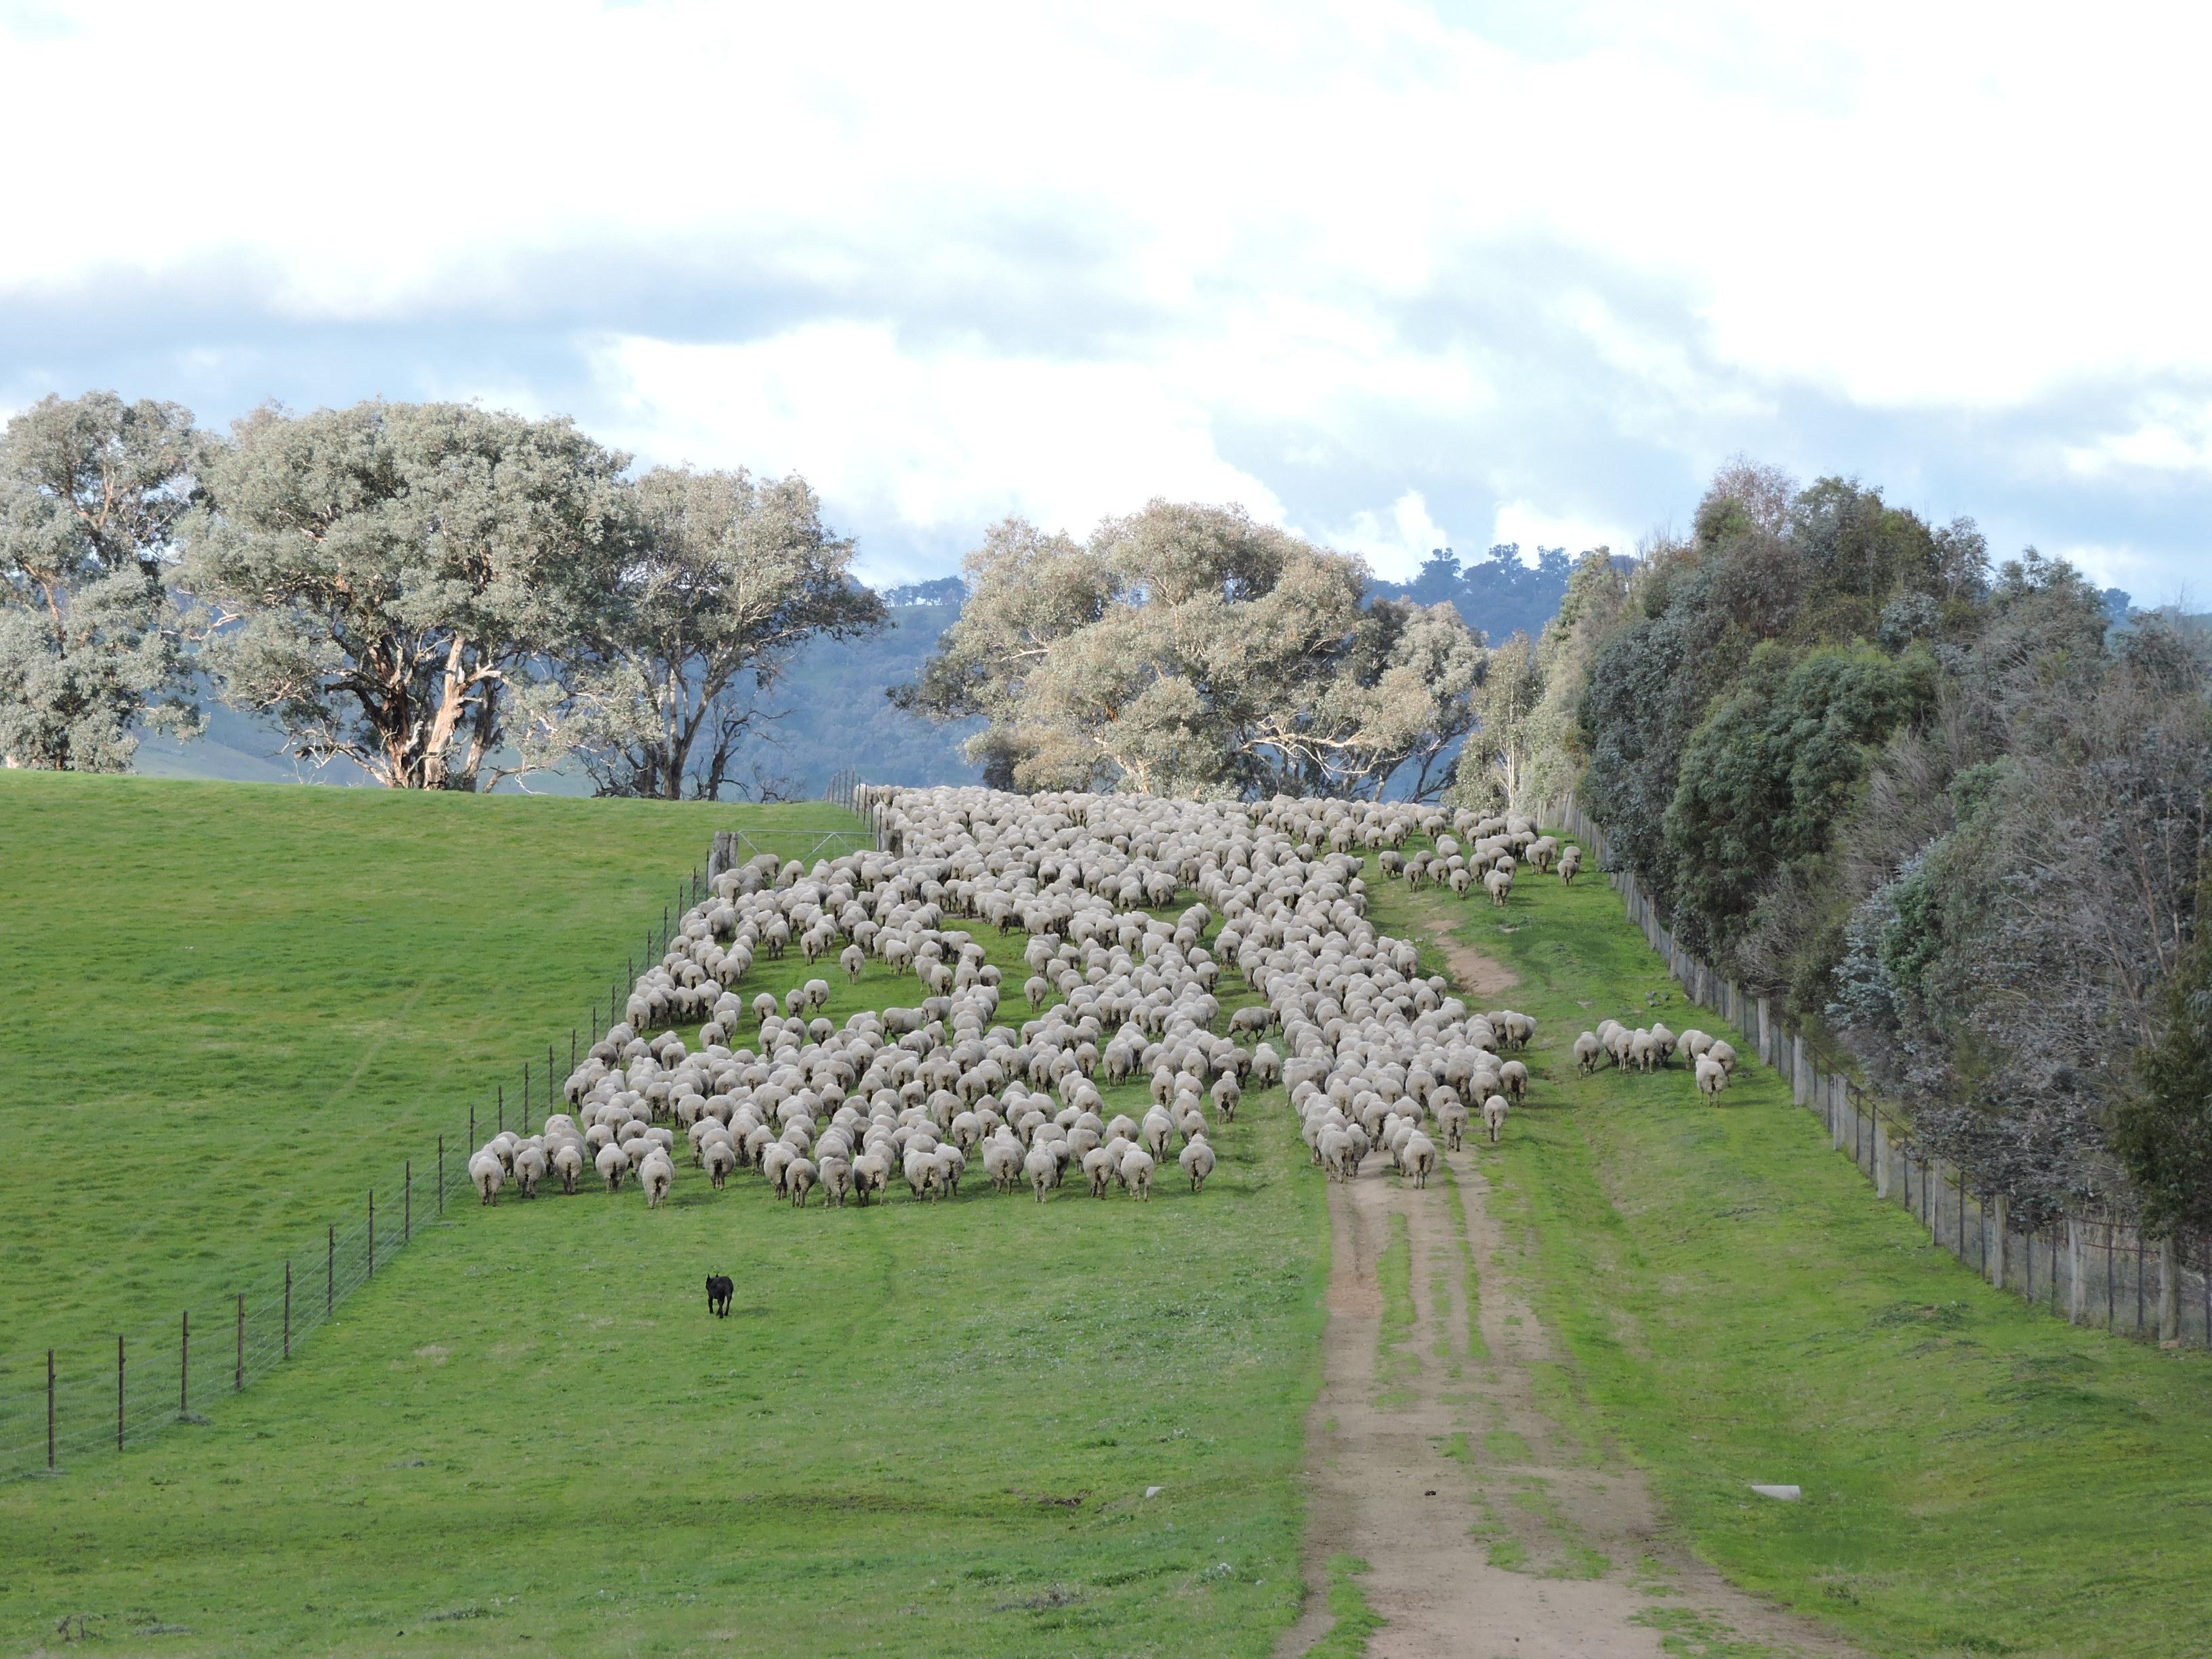 Moving sheep down laneway